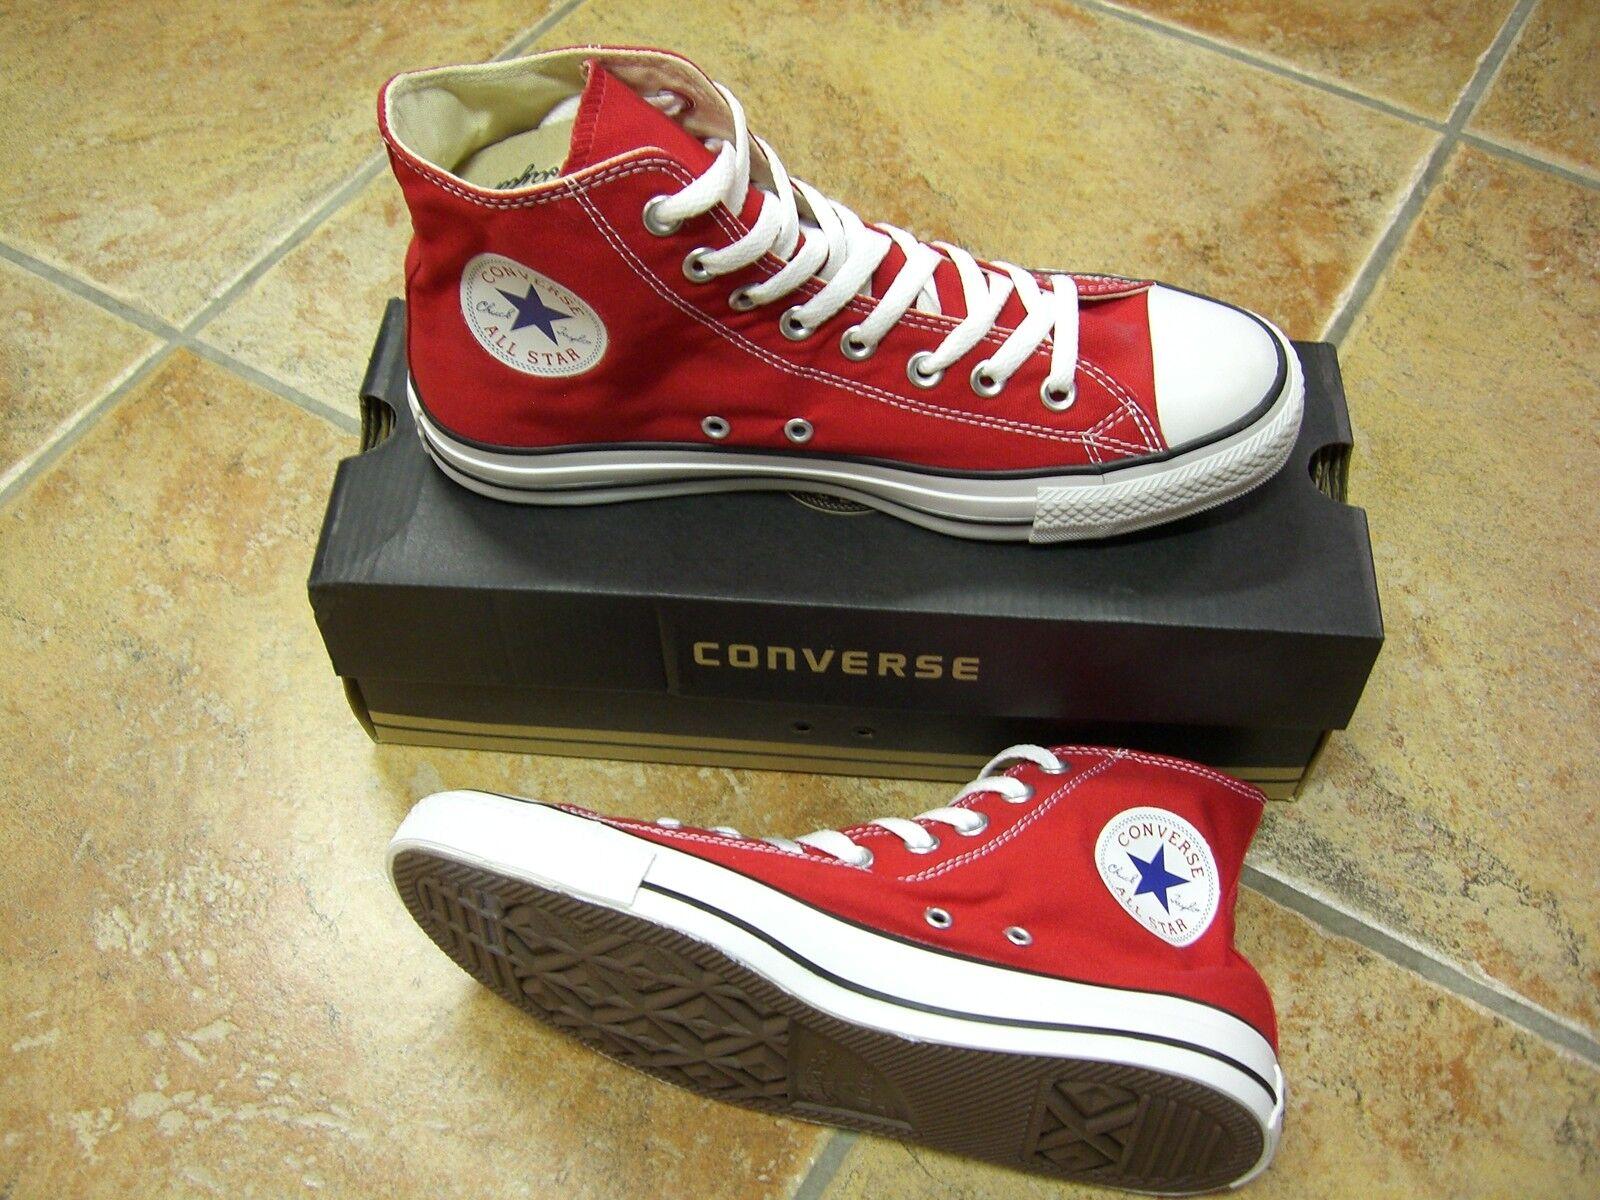 Converse Chucks All Star HI Gr.39 Red M9621 Rot Neu Top